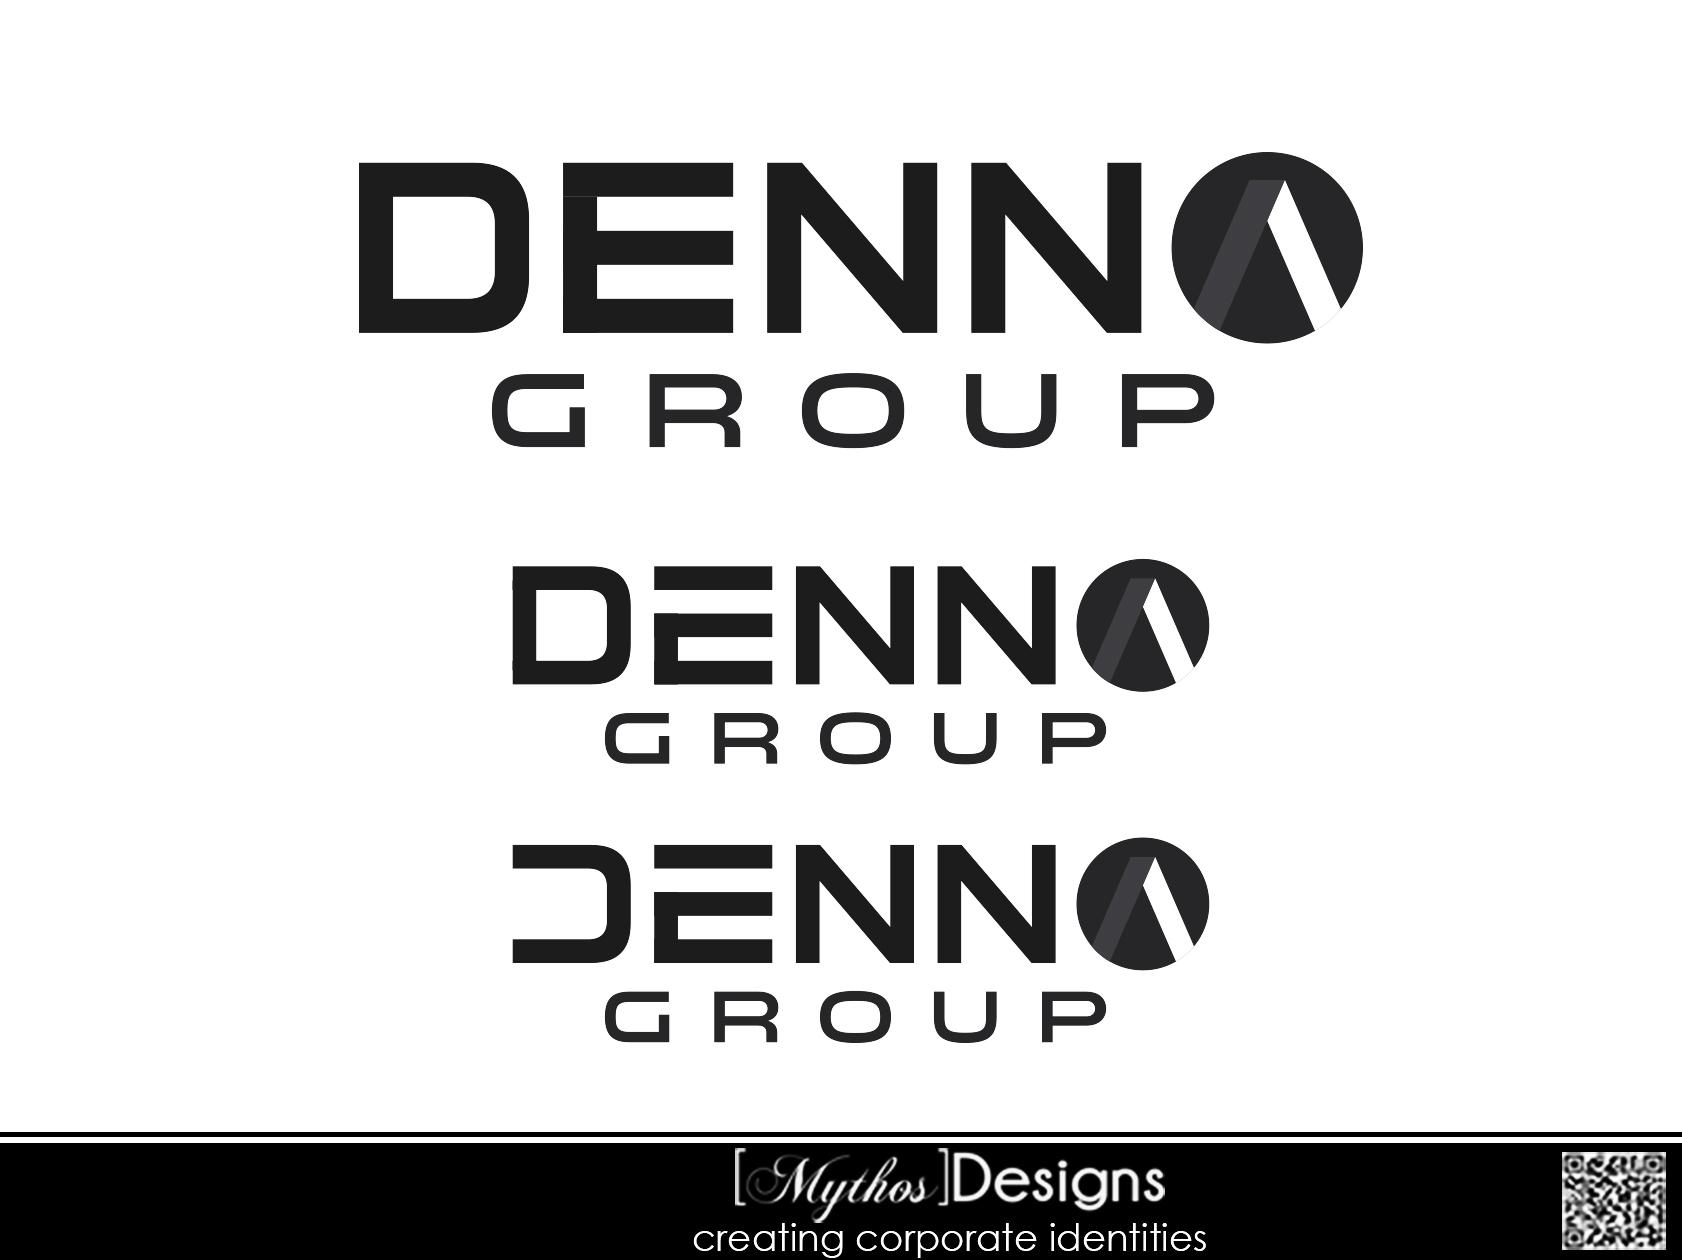 Logo Design by Mythos Designs - Entry No. 210 in the Logo Design Contest Denna Group Logo Design.